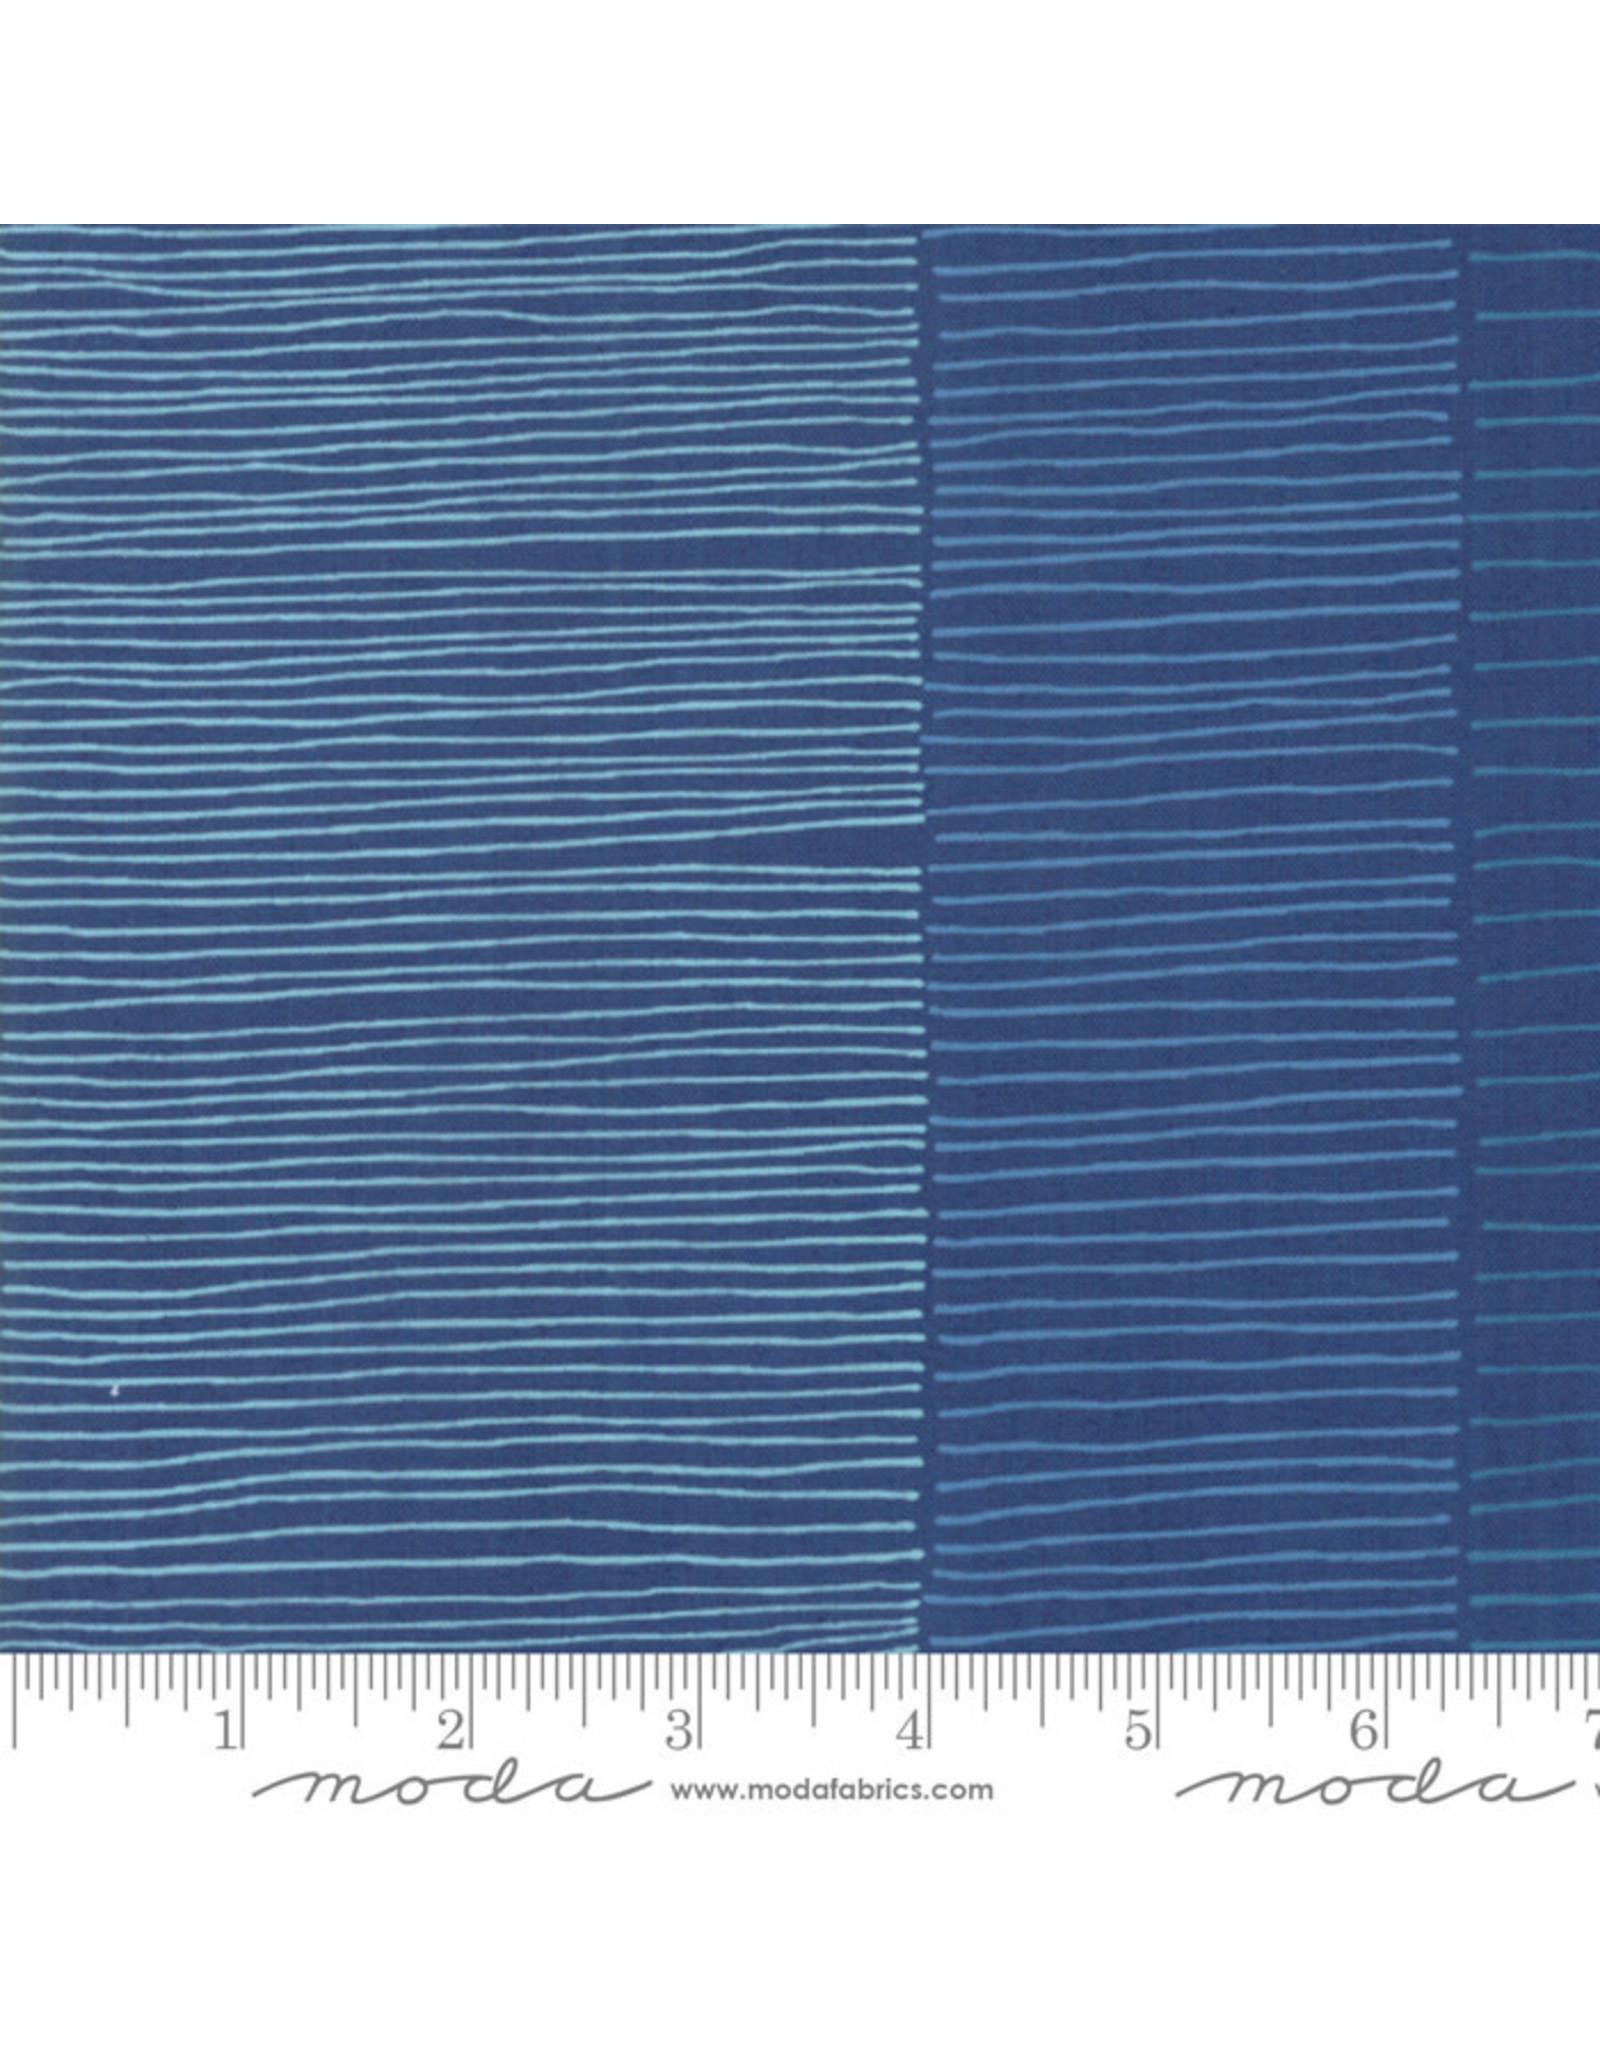 Moda Breeze - Fire Lines Dark Blue coupon (± 22 x 110 cm)